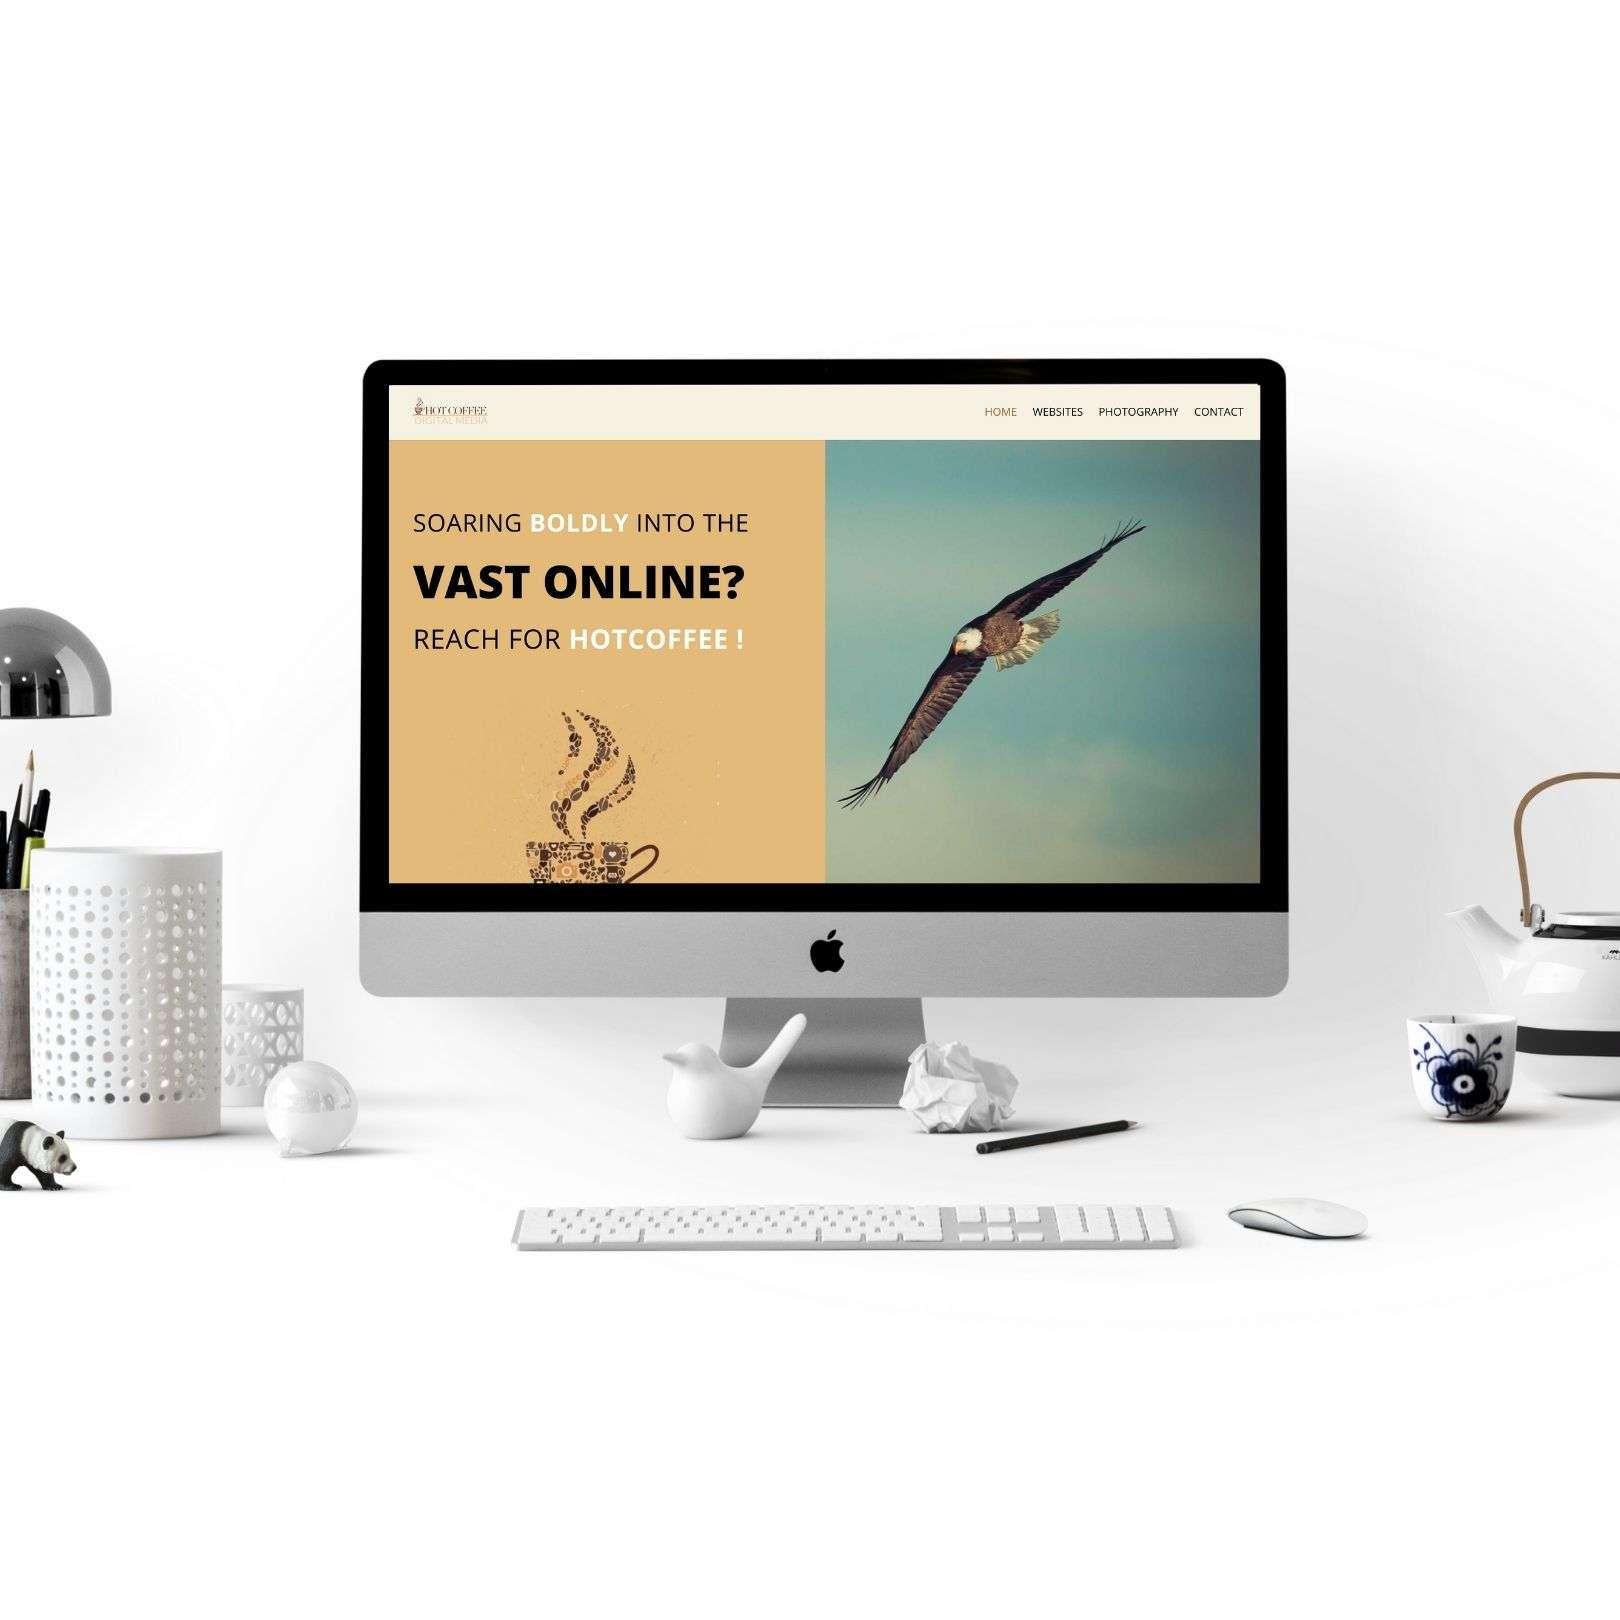 hotcoffeemedia website copywriting